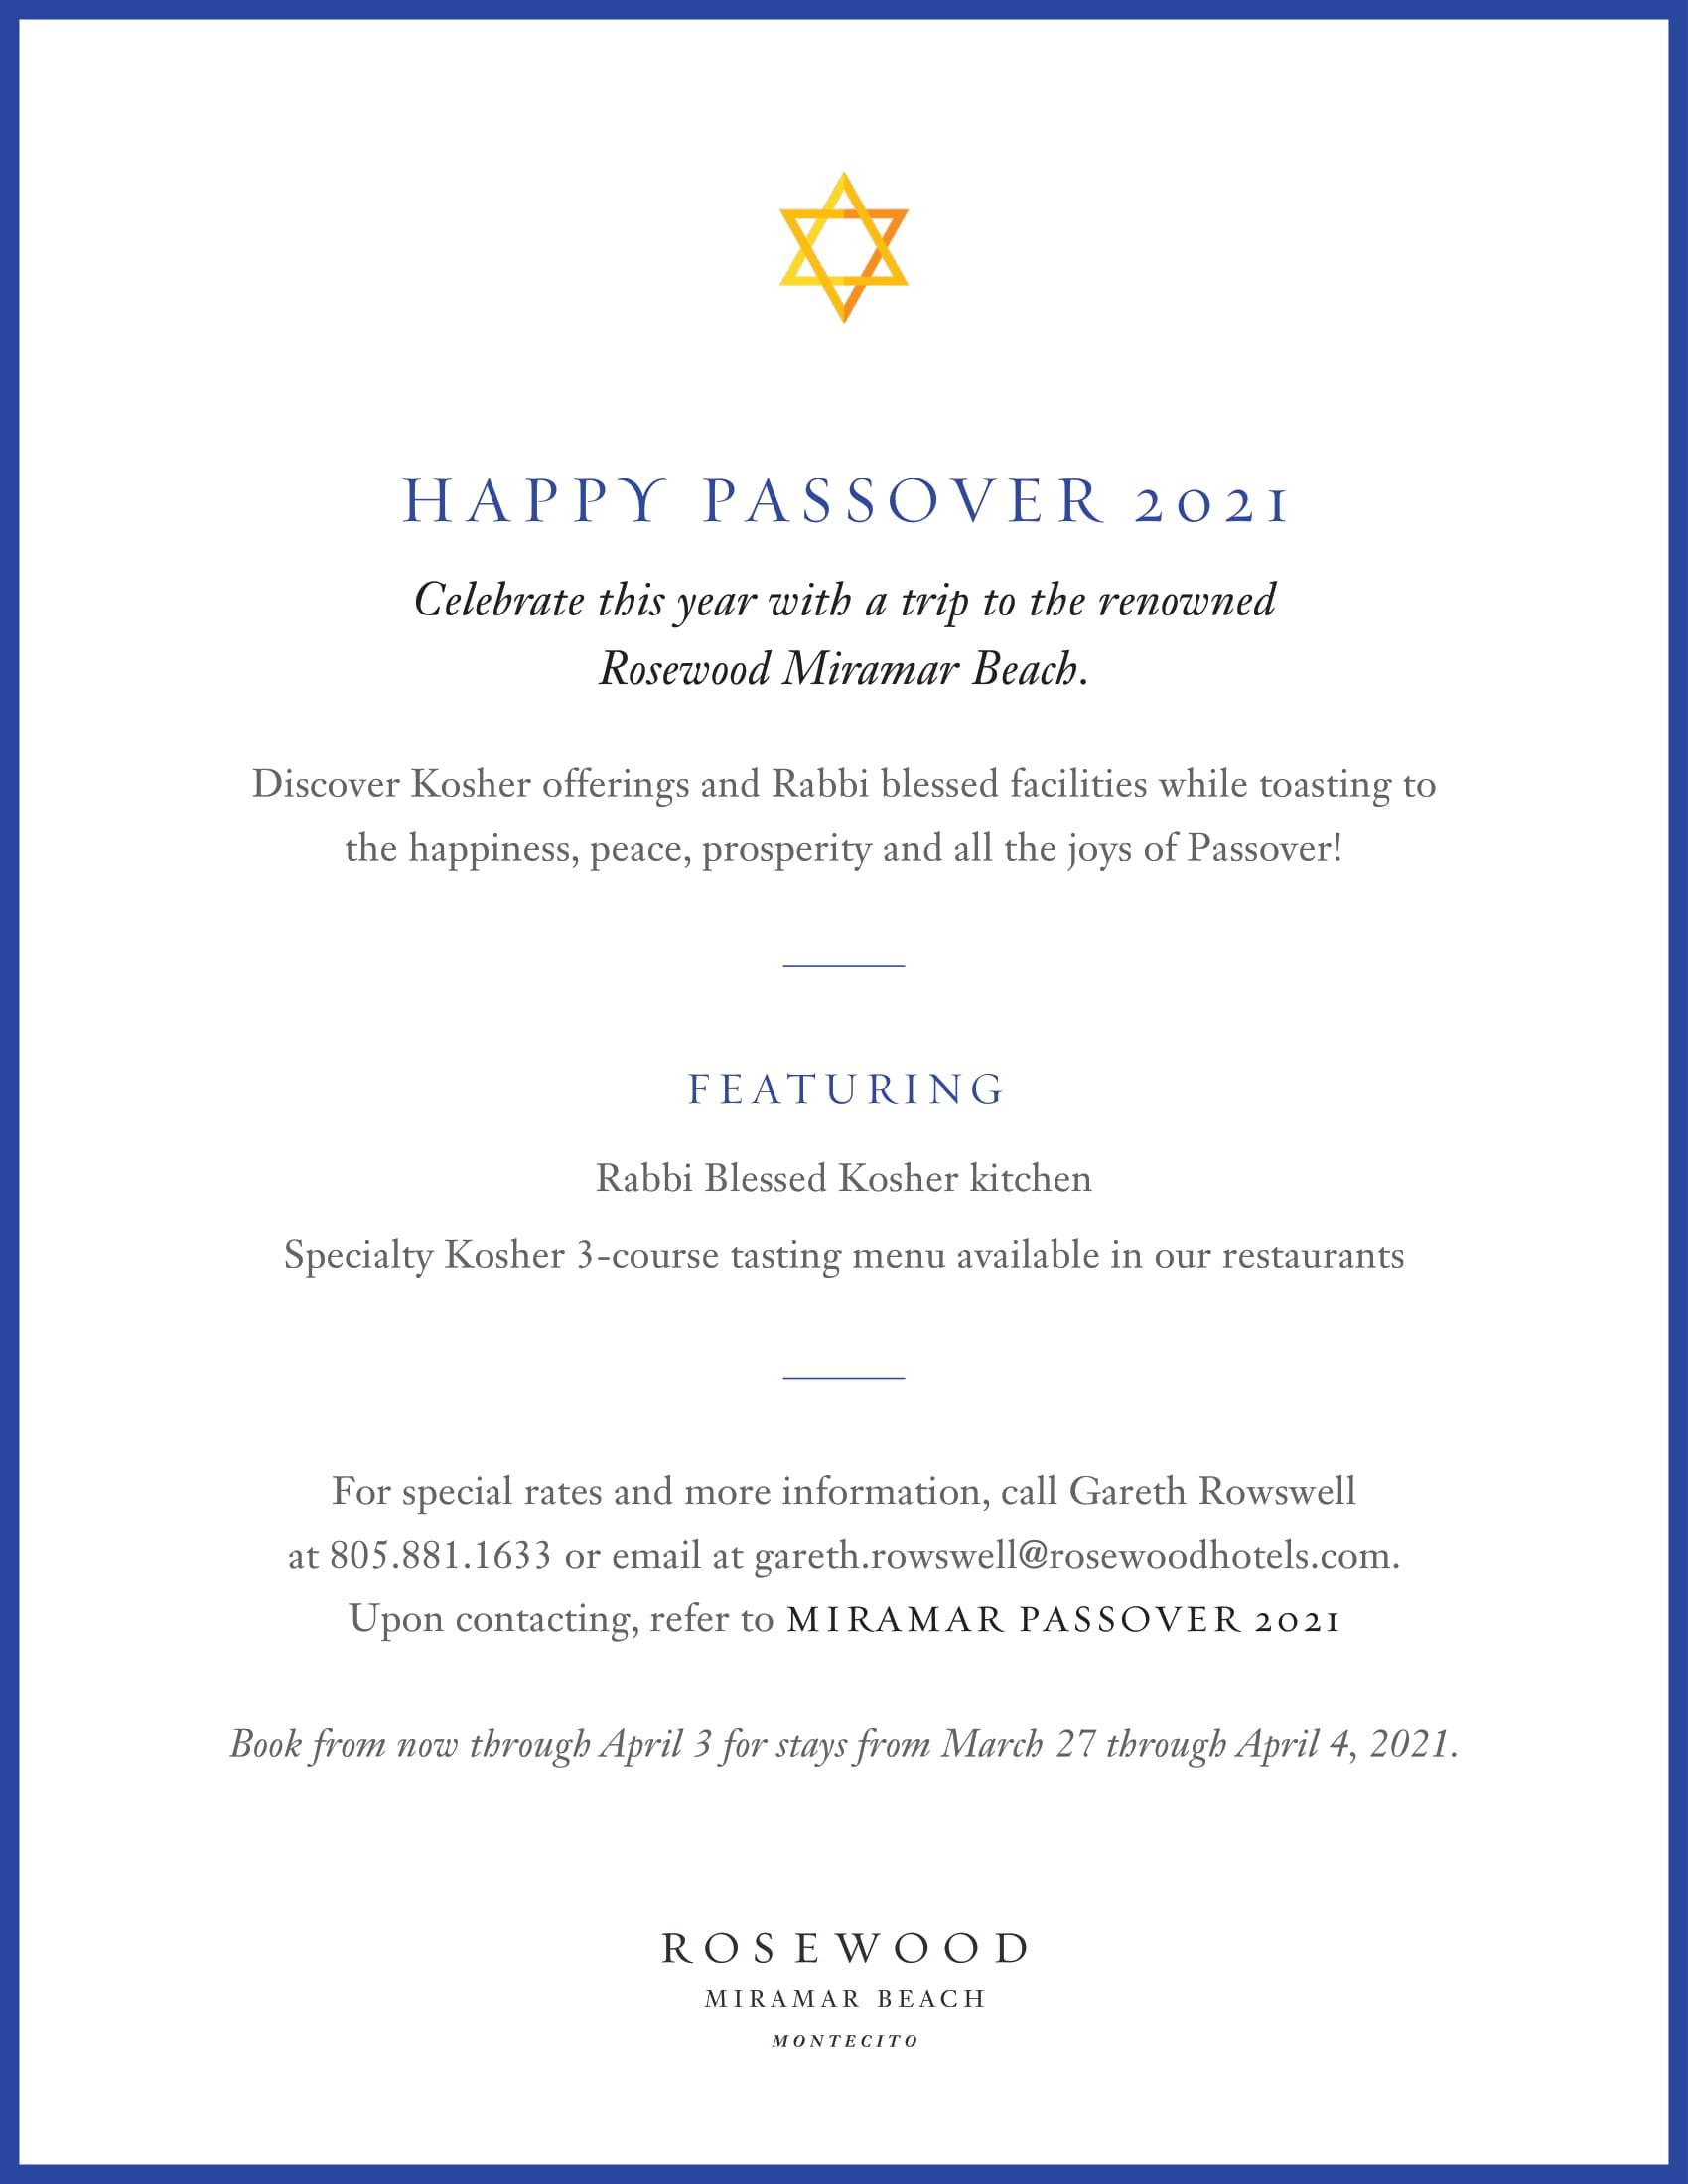 RMB-Passover-2021-1